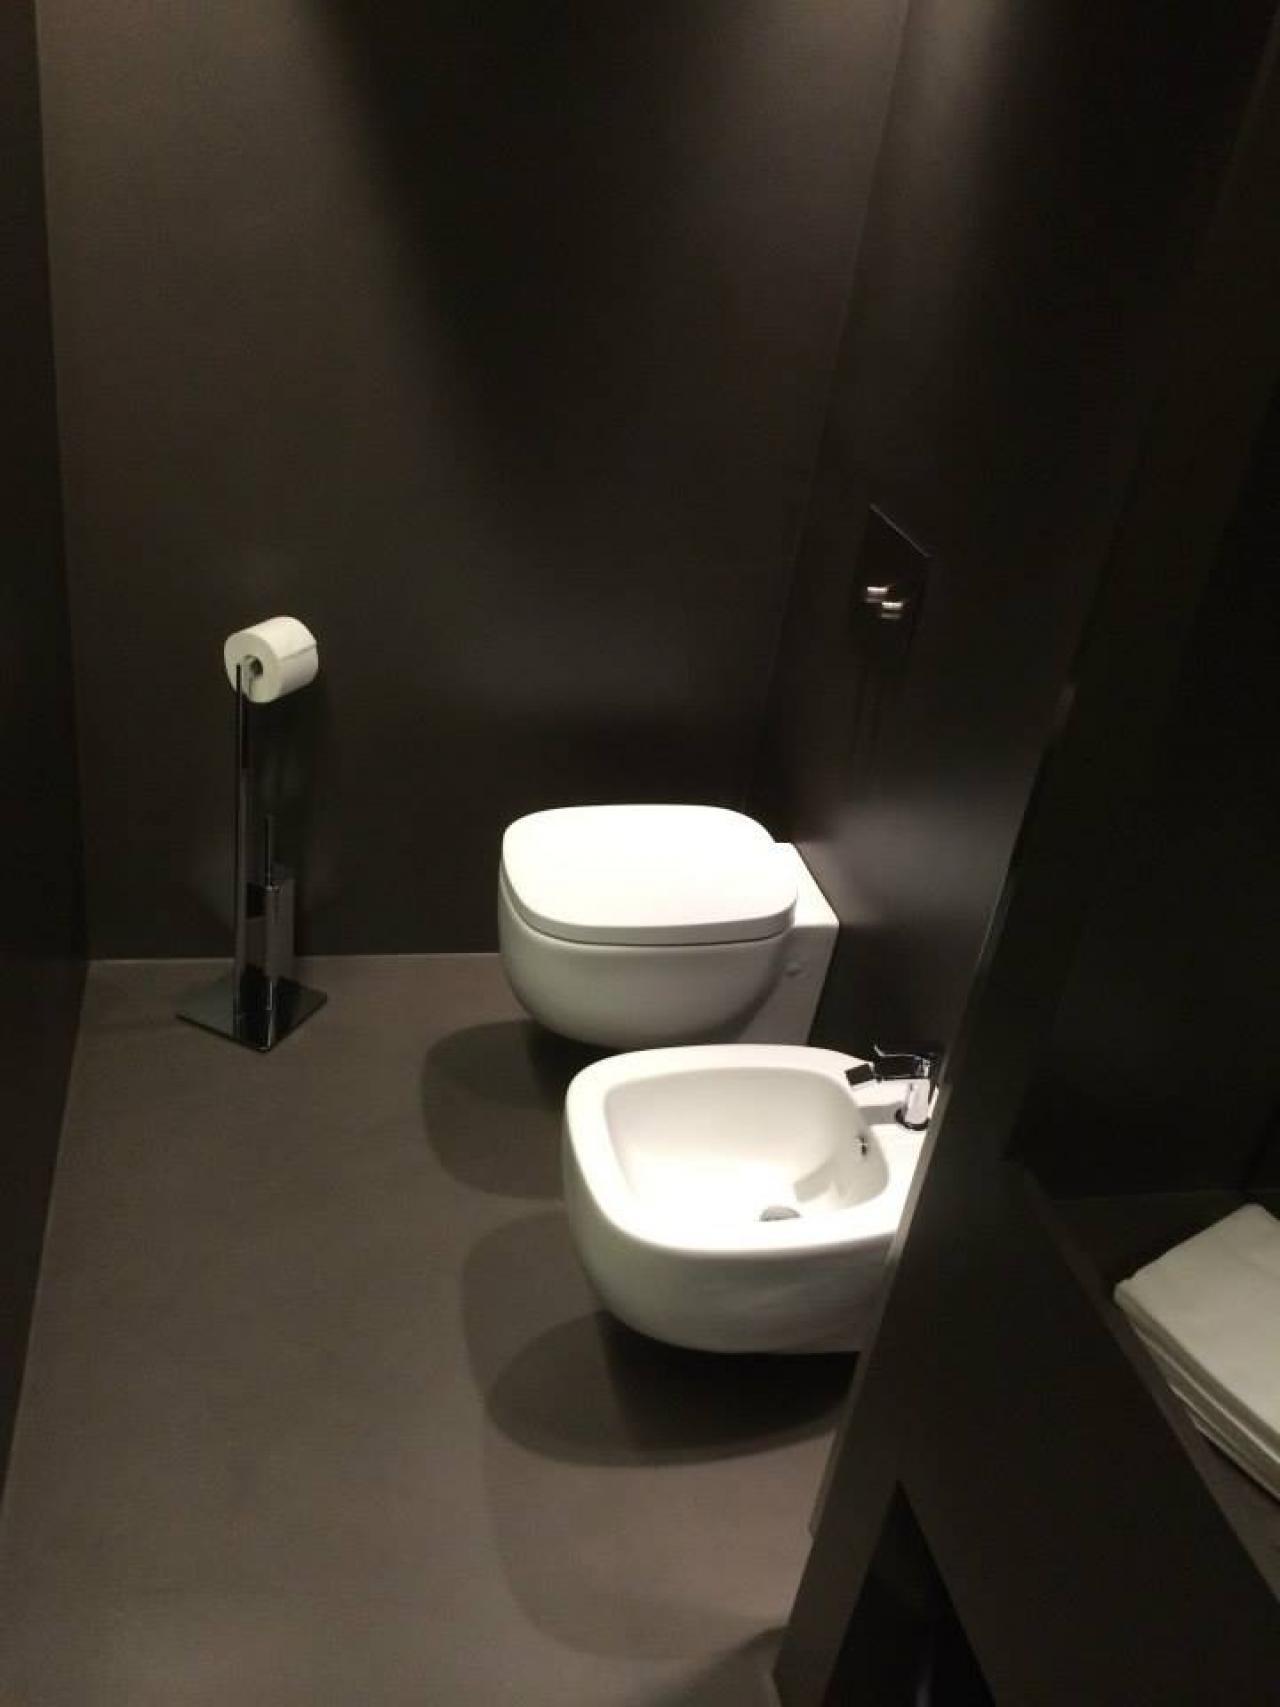 Resina kerakoll per pavimenti e rivestimenti vicenza - Rivestimenti bagno in resina prezzi ...